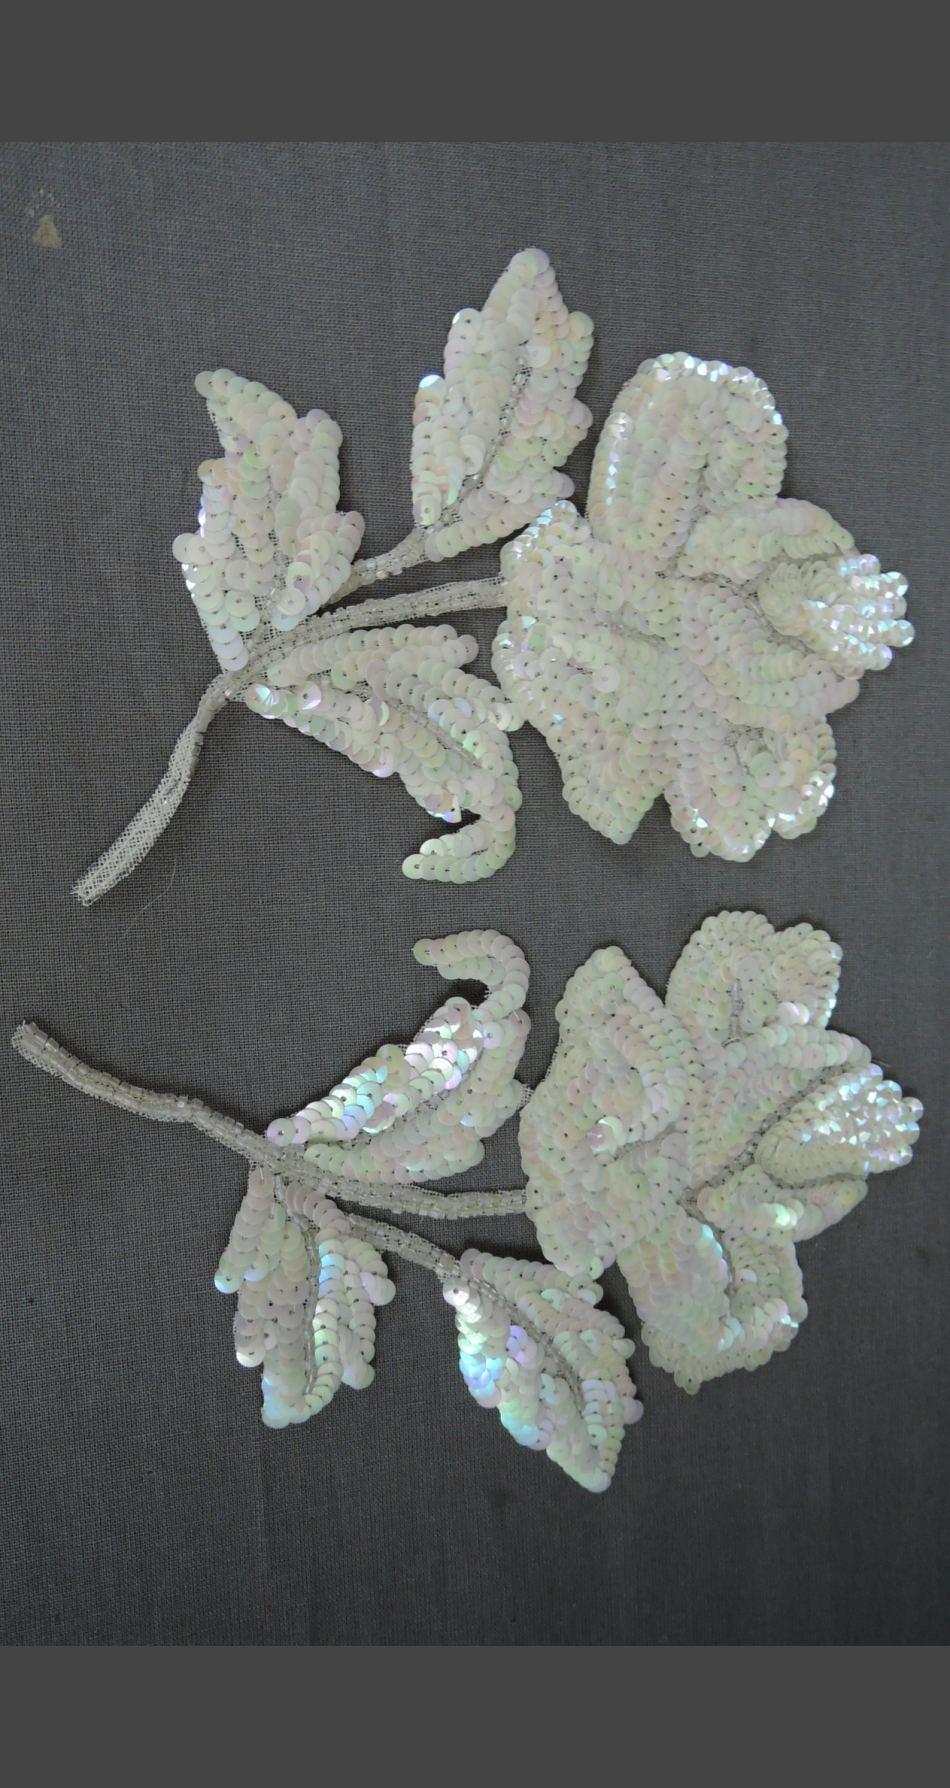 Vintage Set of 1940s Sequin Dress Appliques Floral Roses 6-1/2 inches